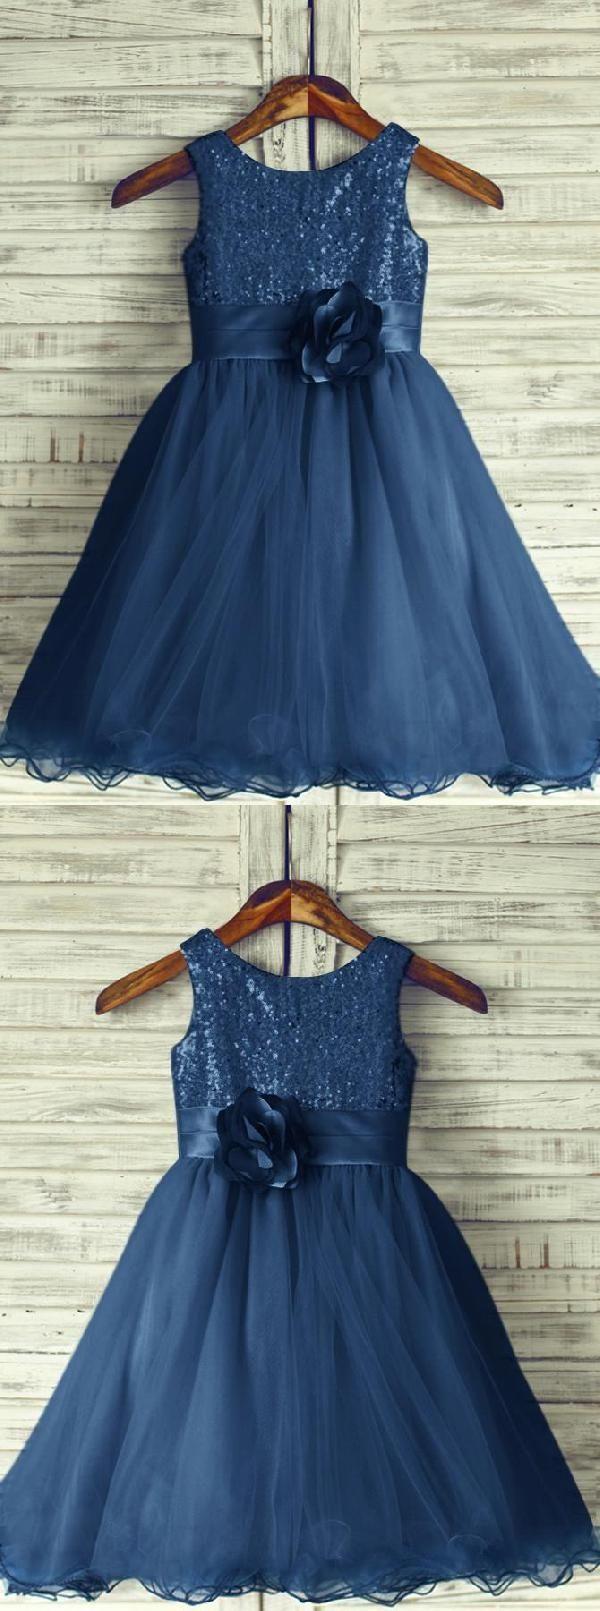 Outlet fetching navy wedding dresses aline wedding dresses blue